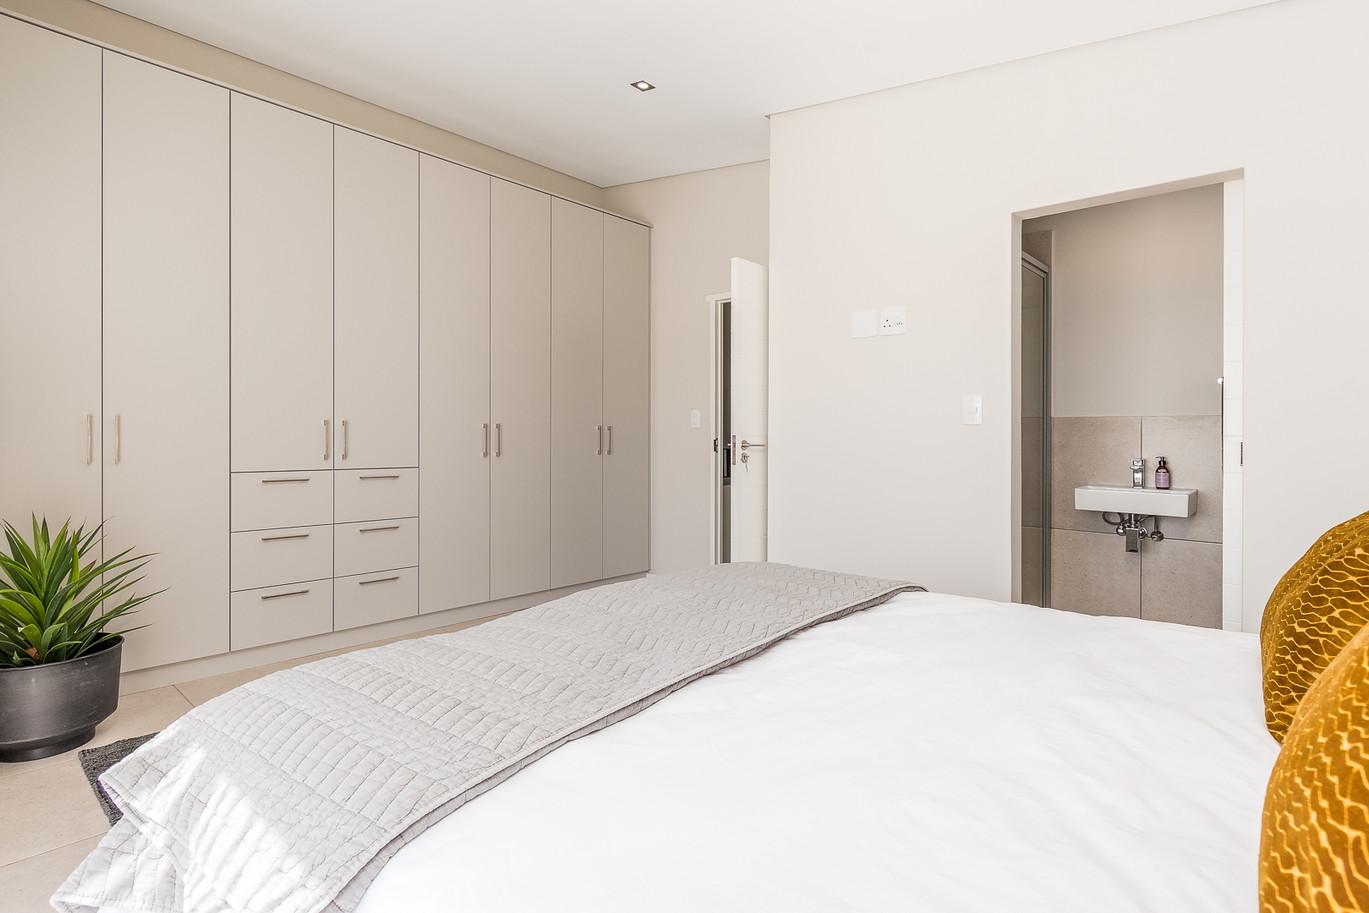 Greystone Master Bedroom 3